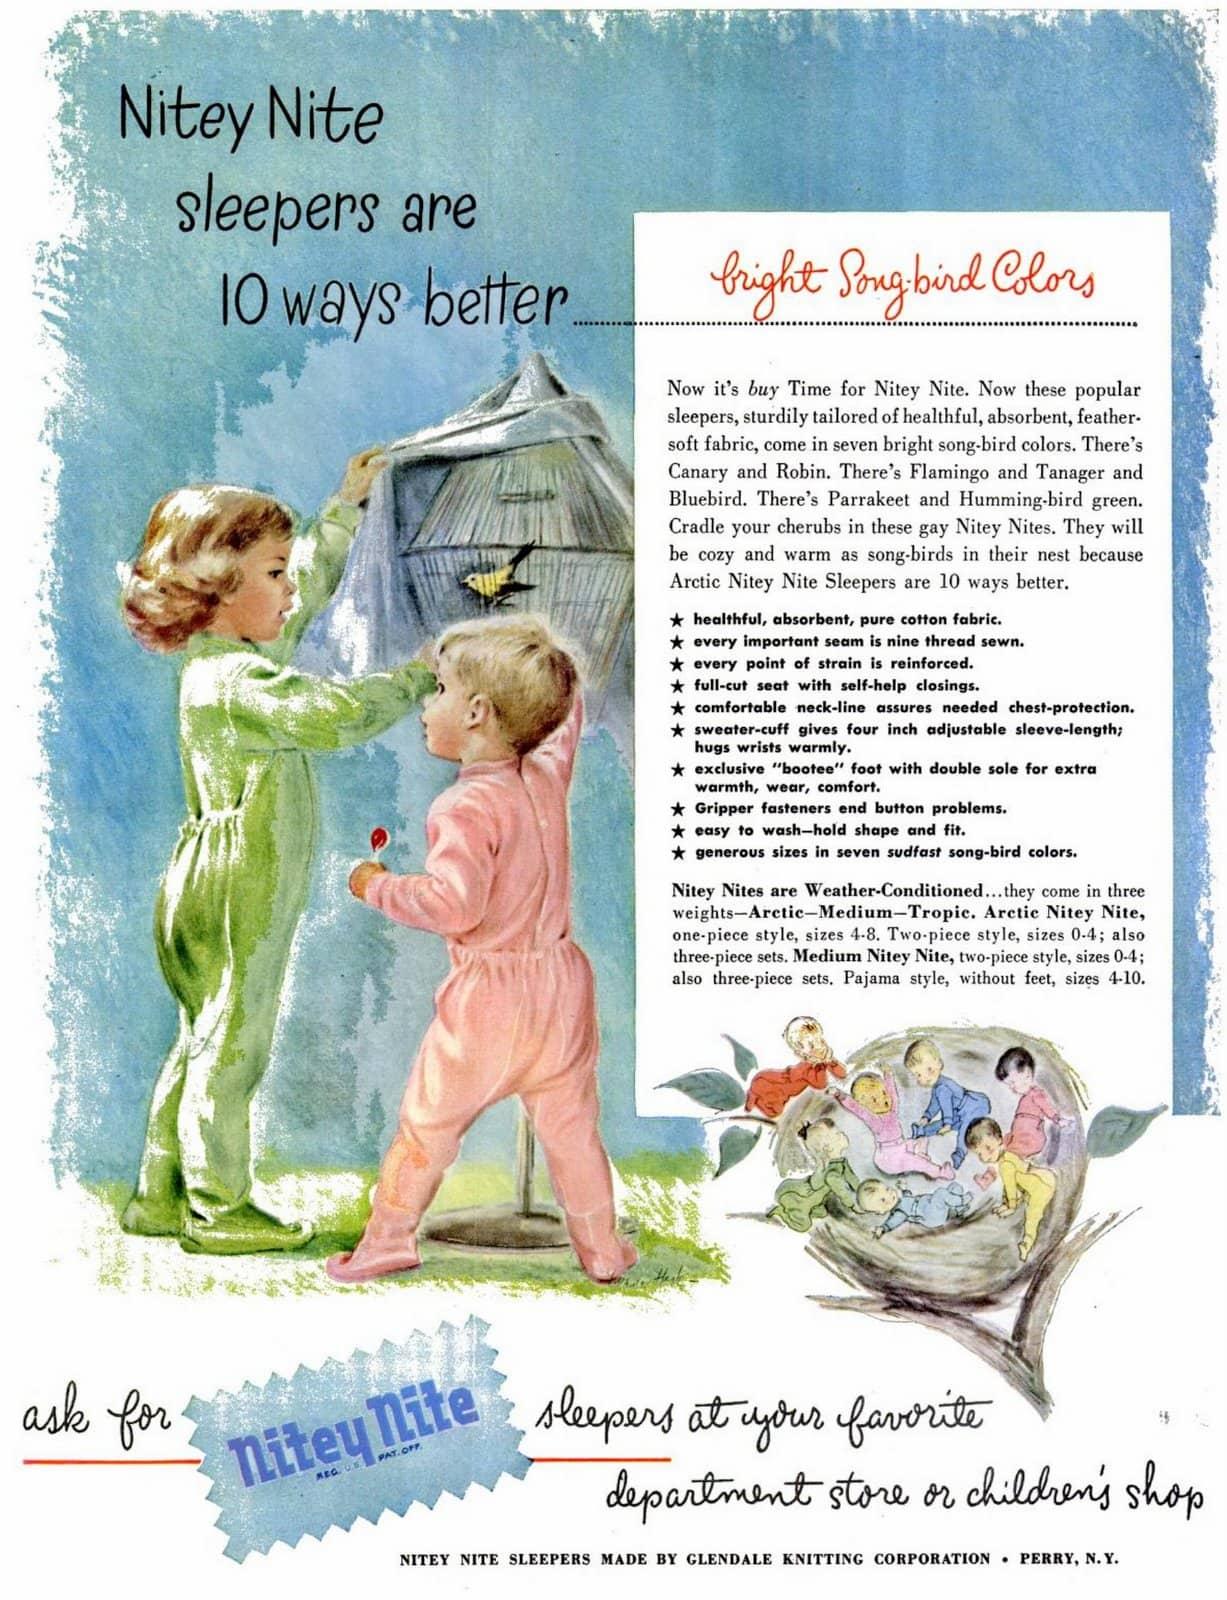 Old Nitey Nite pajama sleepers for kids (1949)